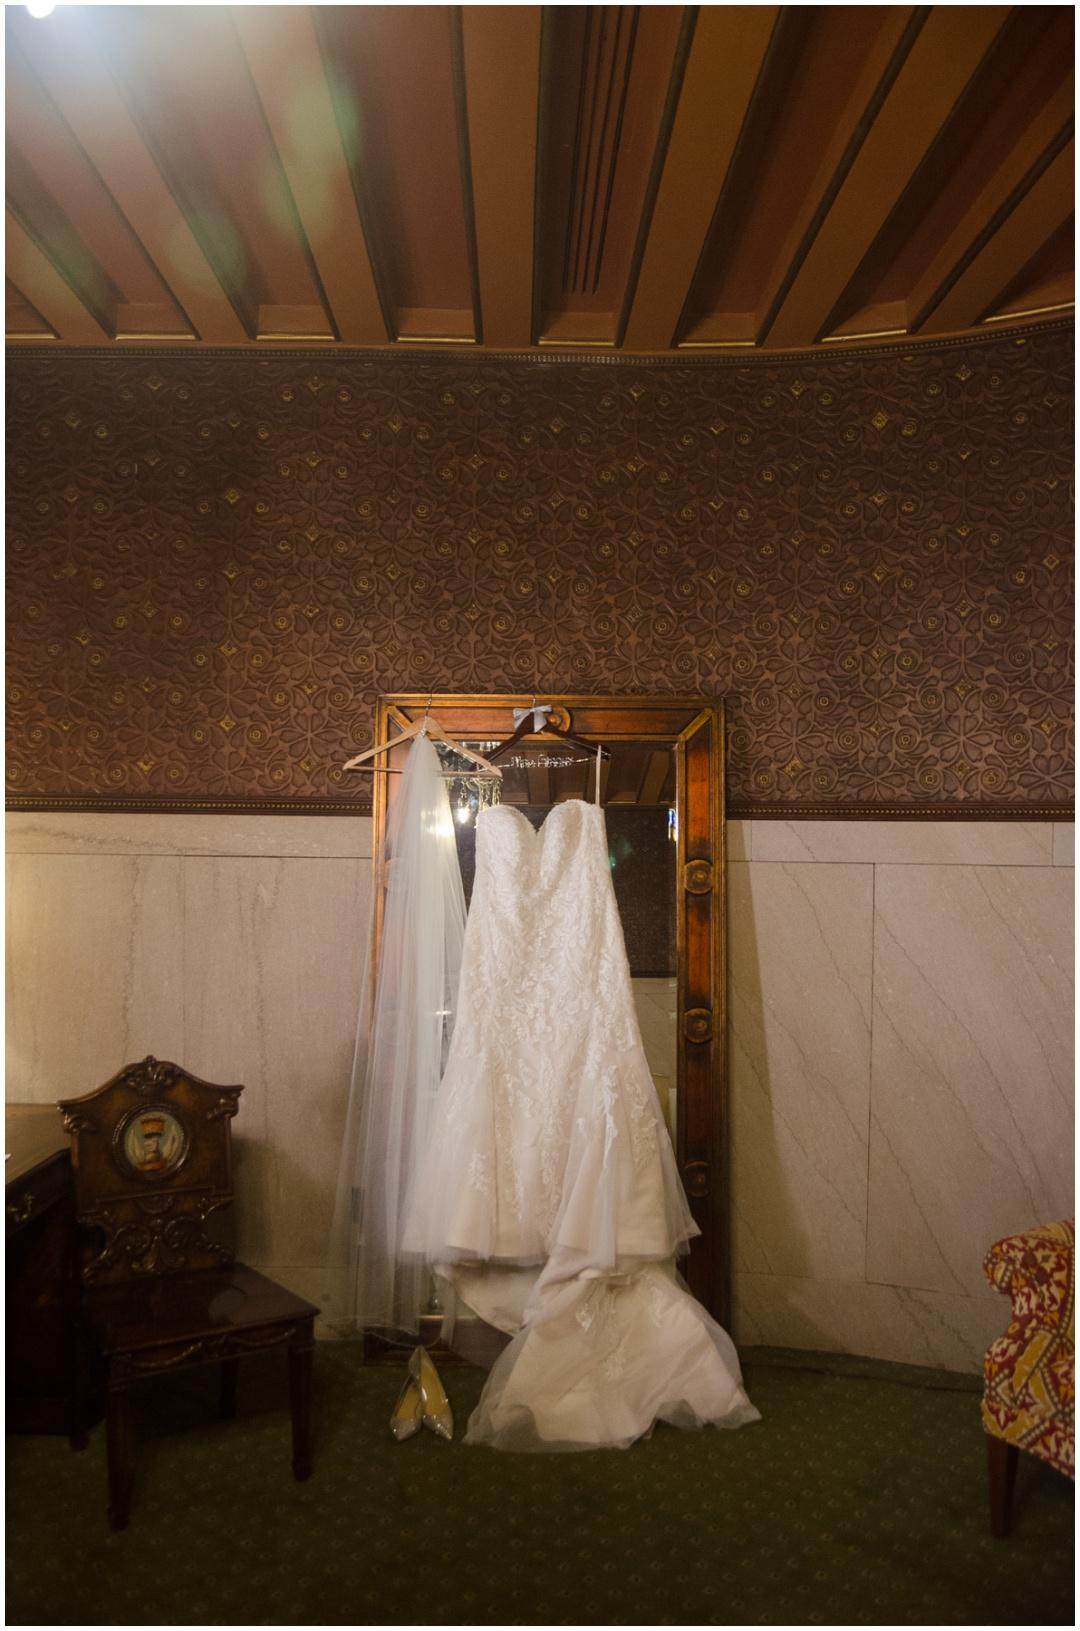 The-Grand-Wedding-Photos-Aaron-Haslinger-Photography_0002.jpg